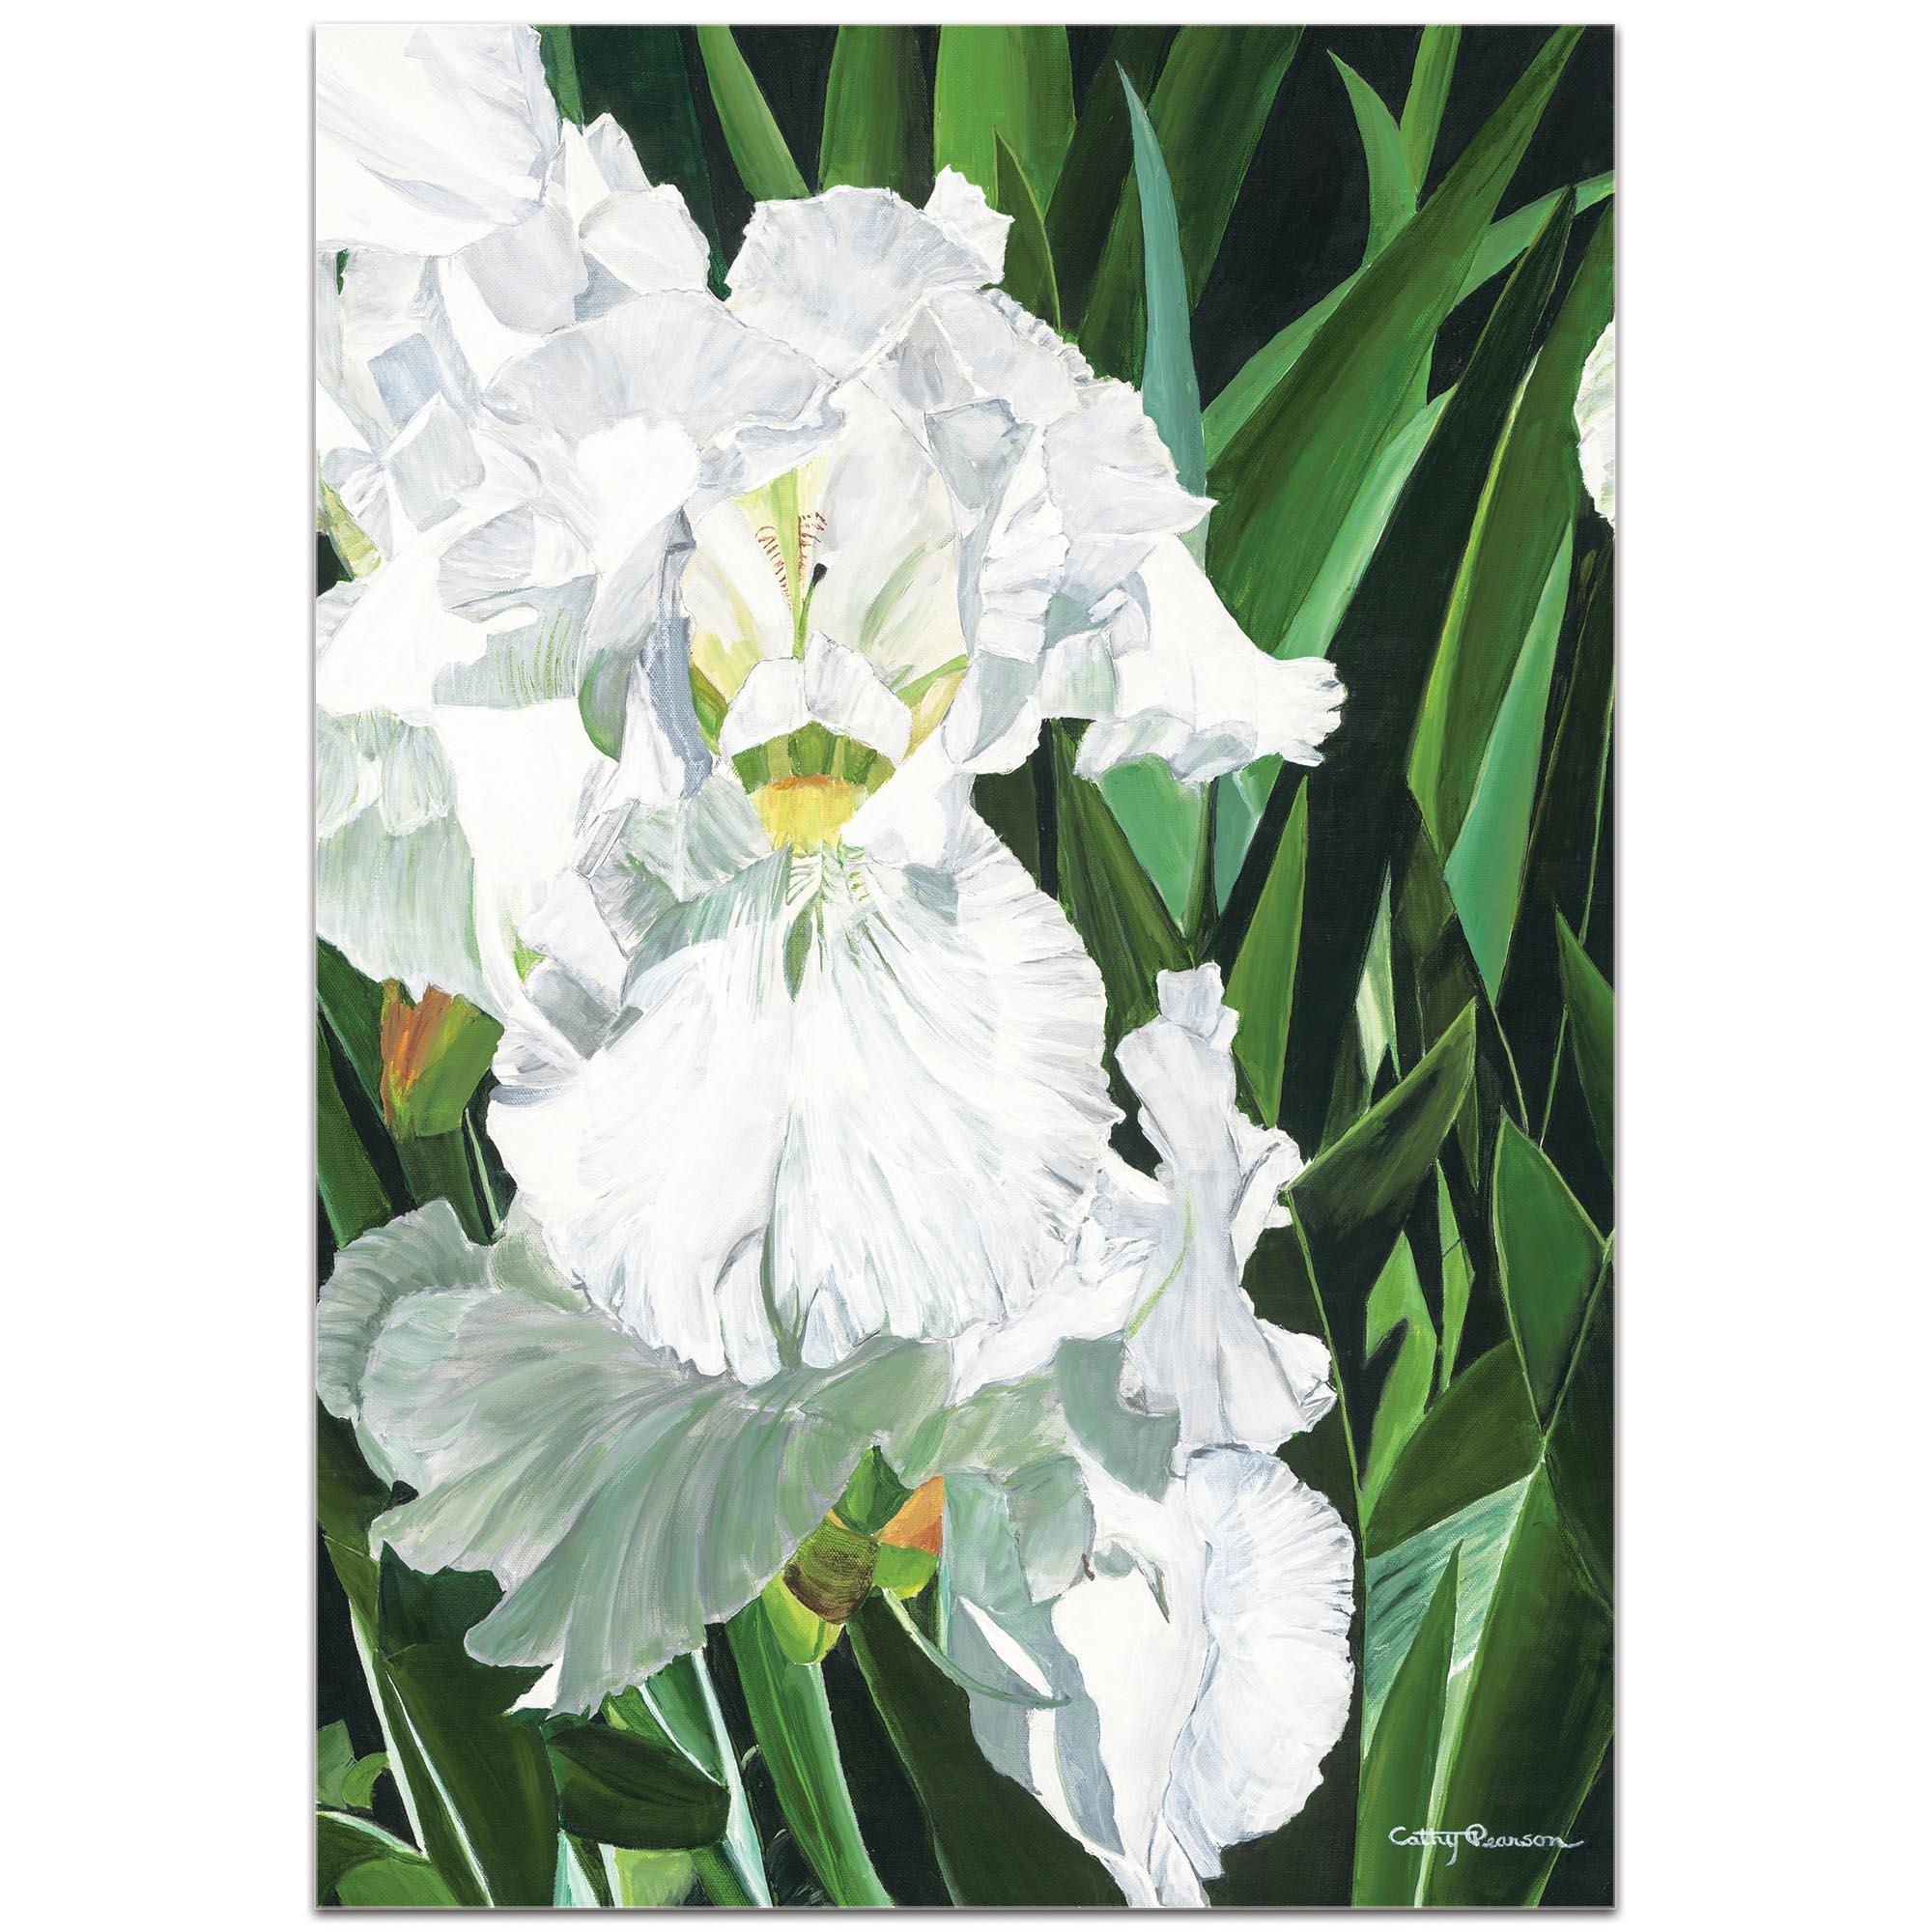 Traditional Wall Art 'Helens Iris' - Floral Decor on Metal or Plexiglass - Image 2